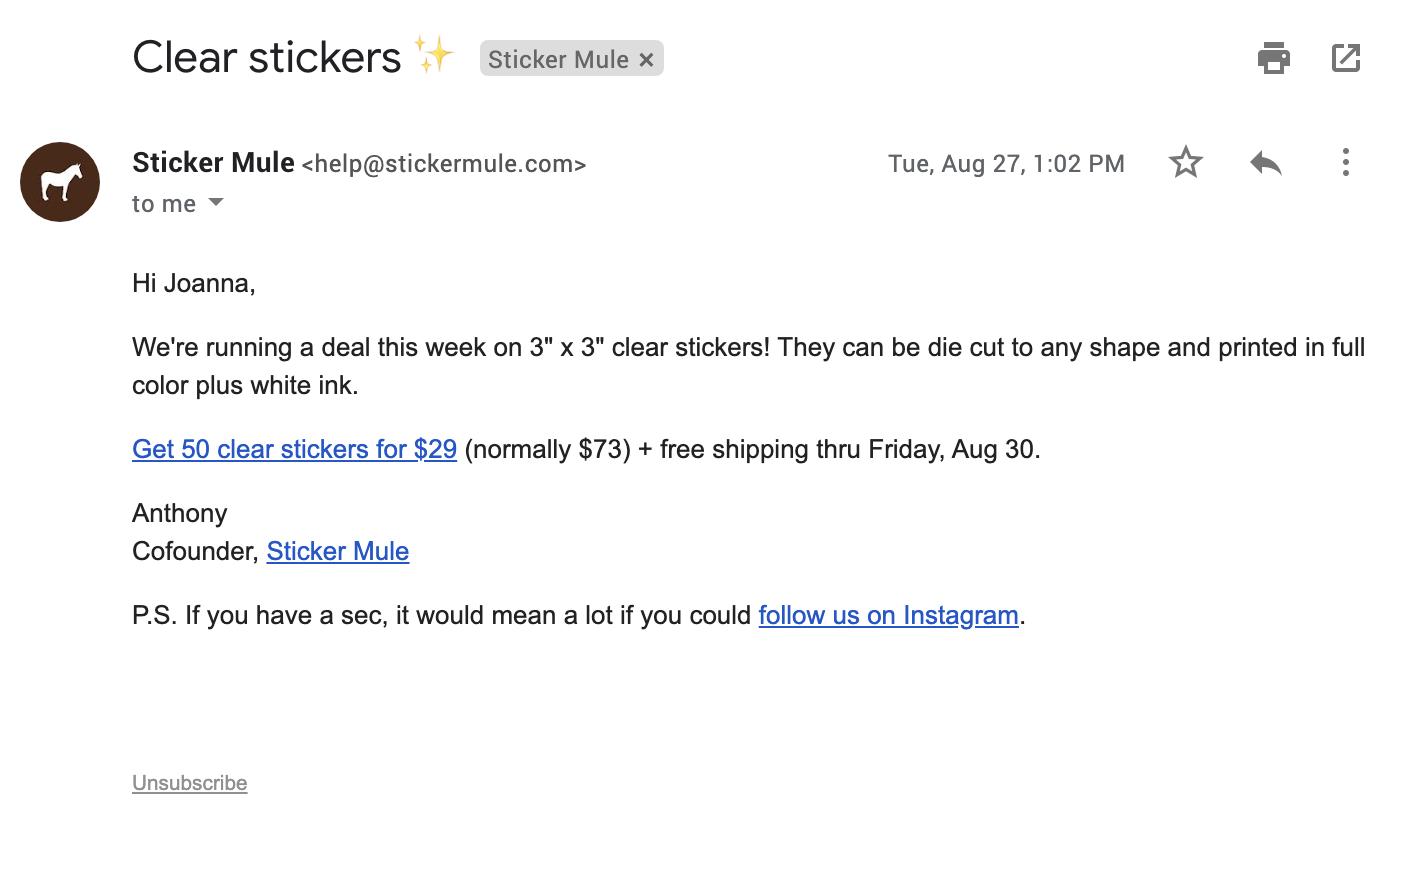 Adesivo Mule e-mail.